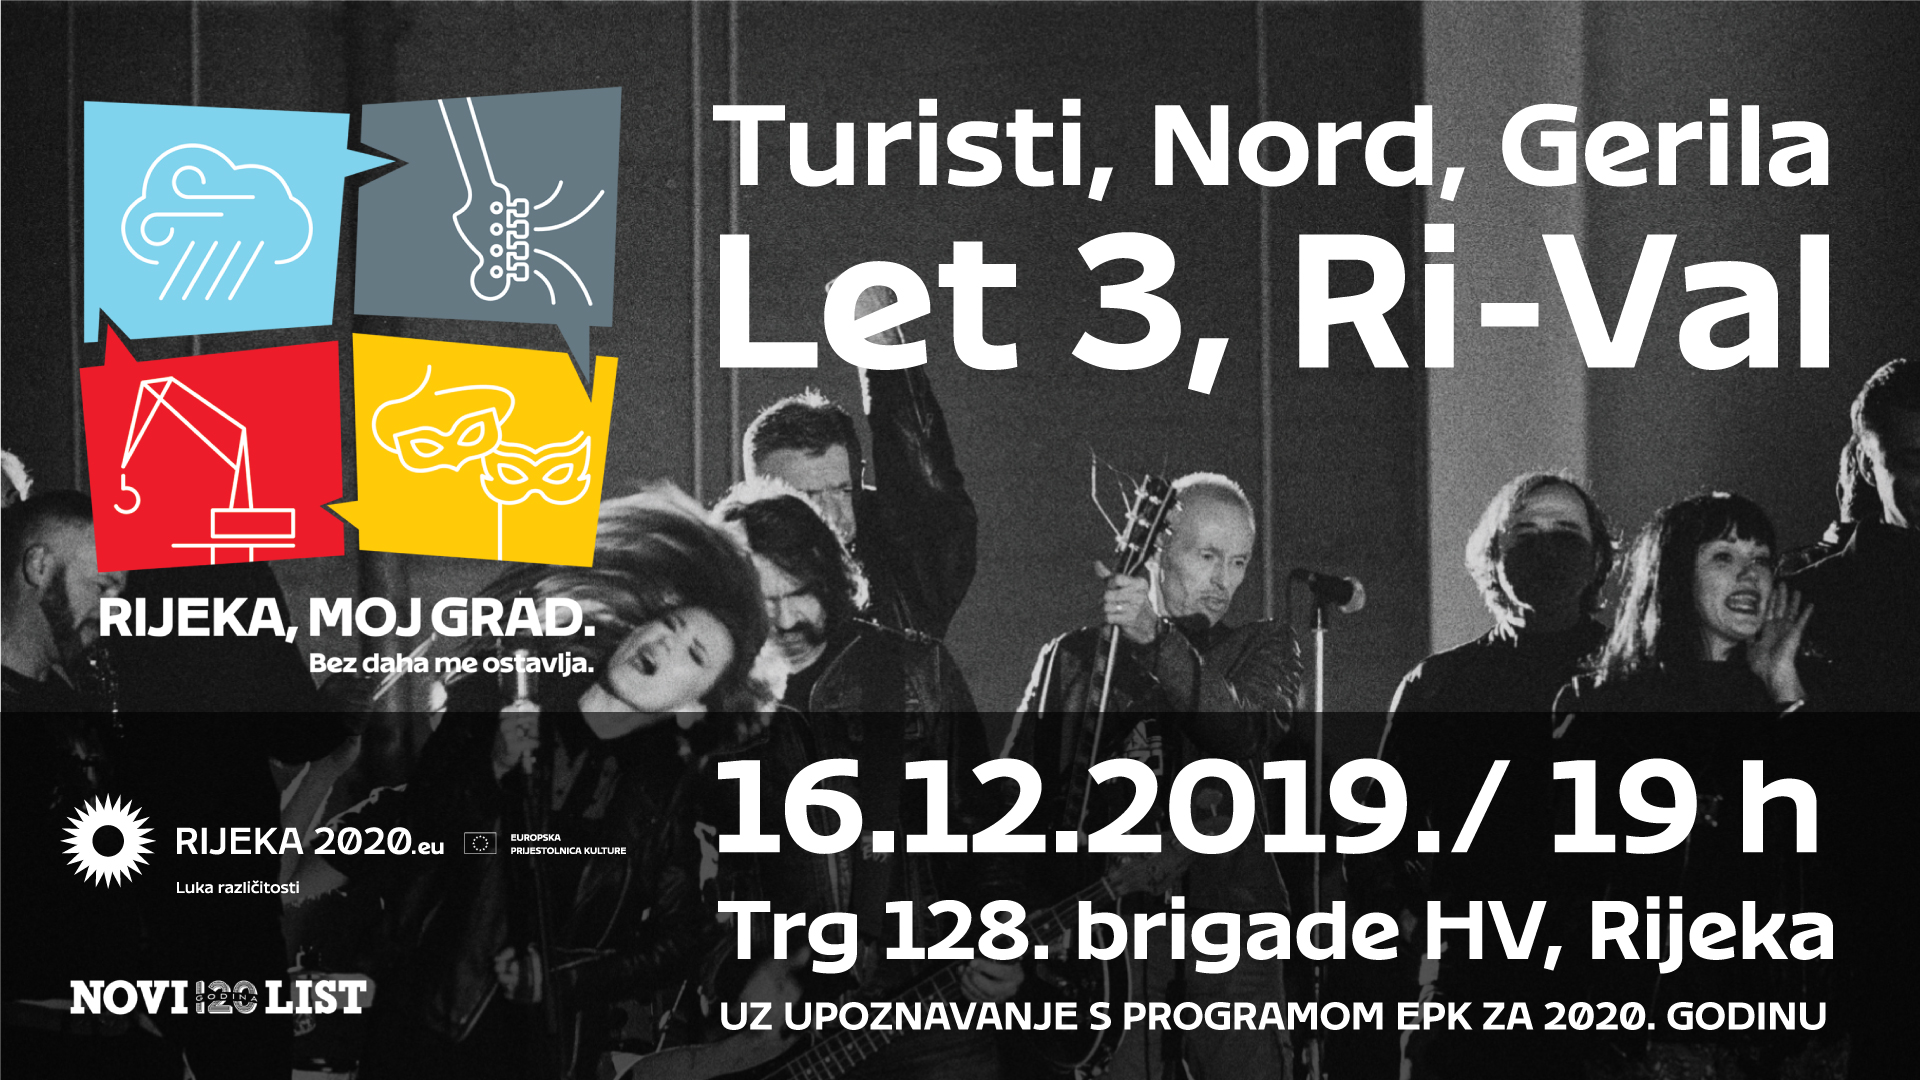 Koncert Rijeka moj grad